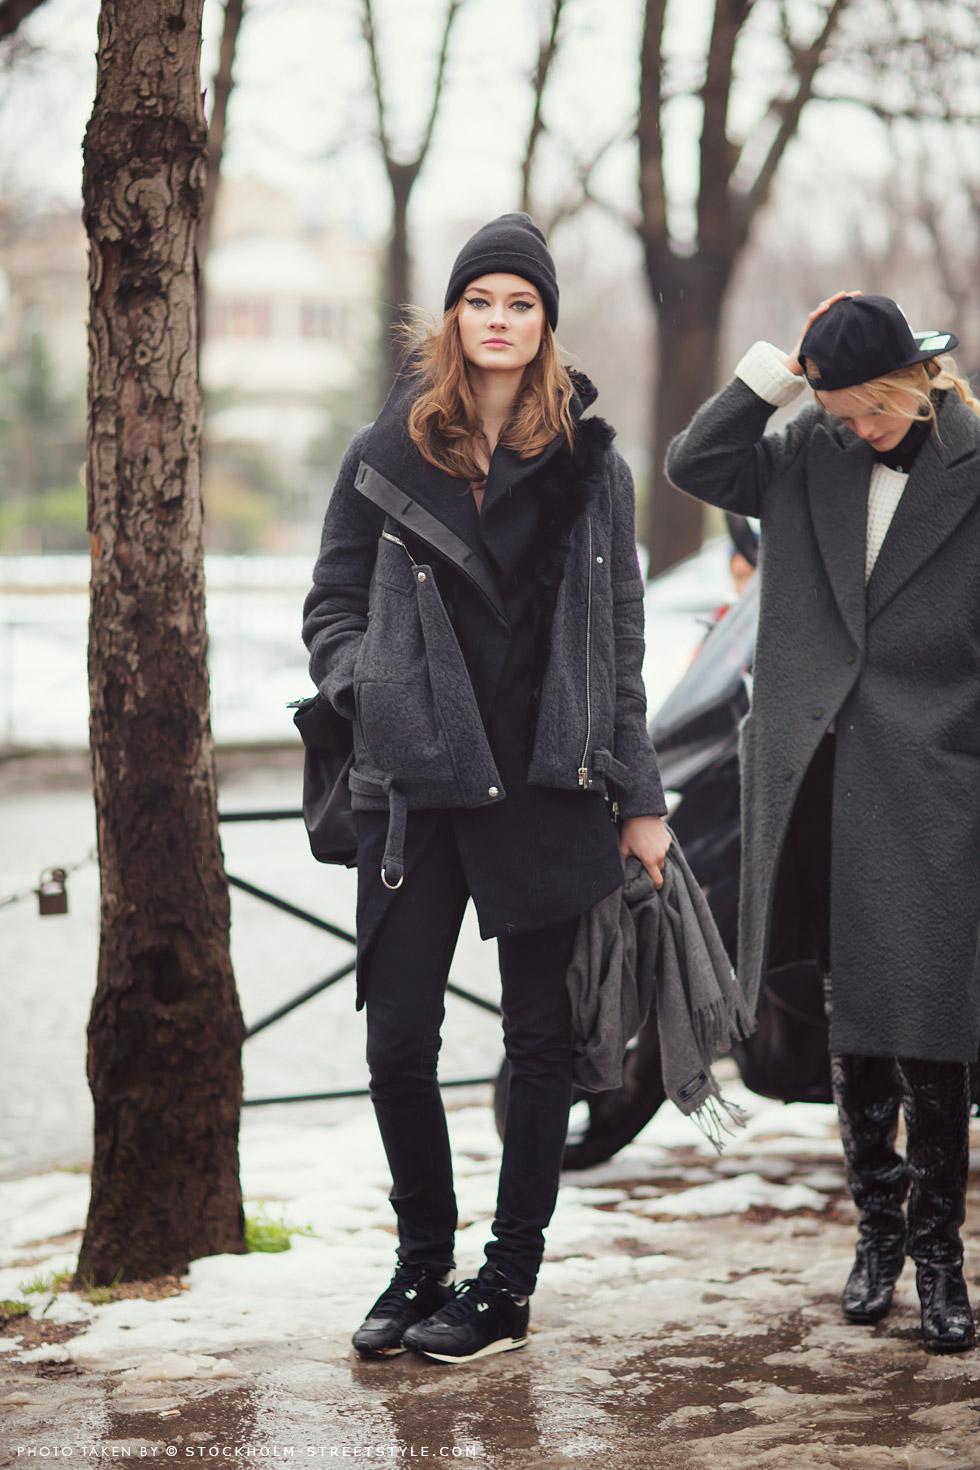 Jac Jagaciak Model Off Duty   Carolines Mode Stockholmstreetstyle   Pinterest Picks - Winter Layers